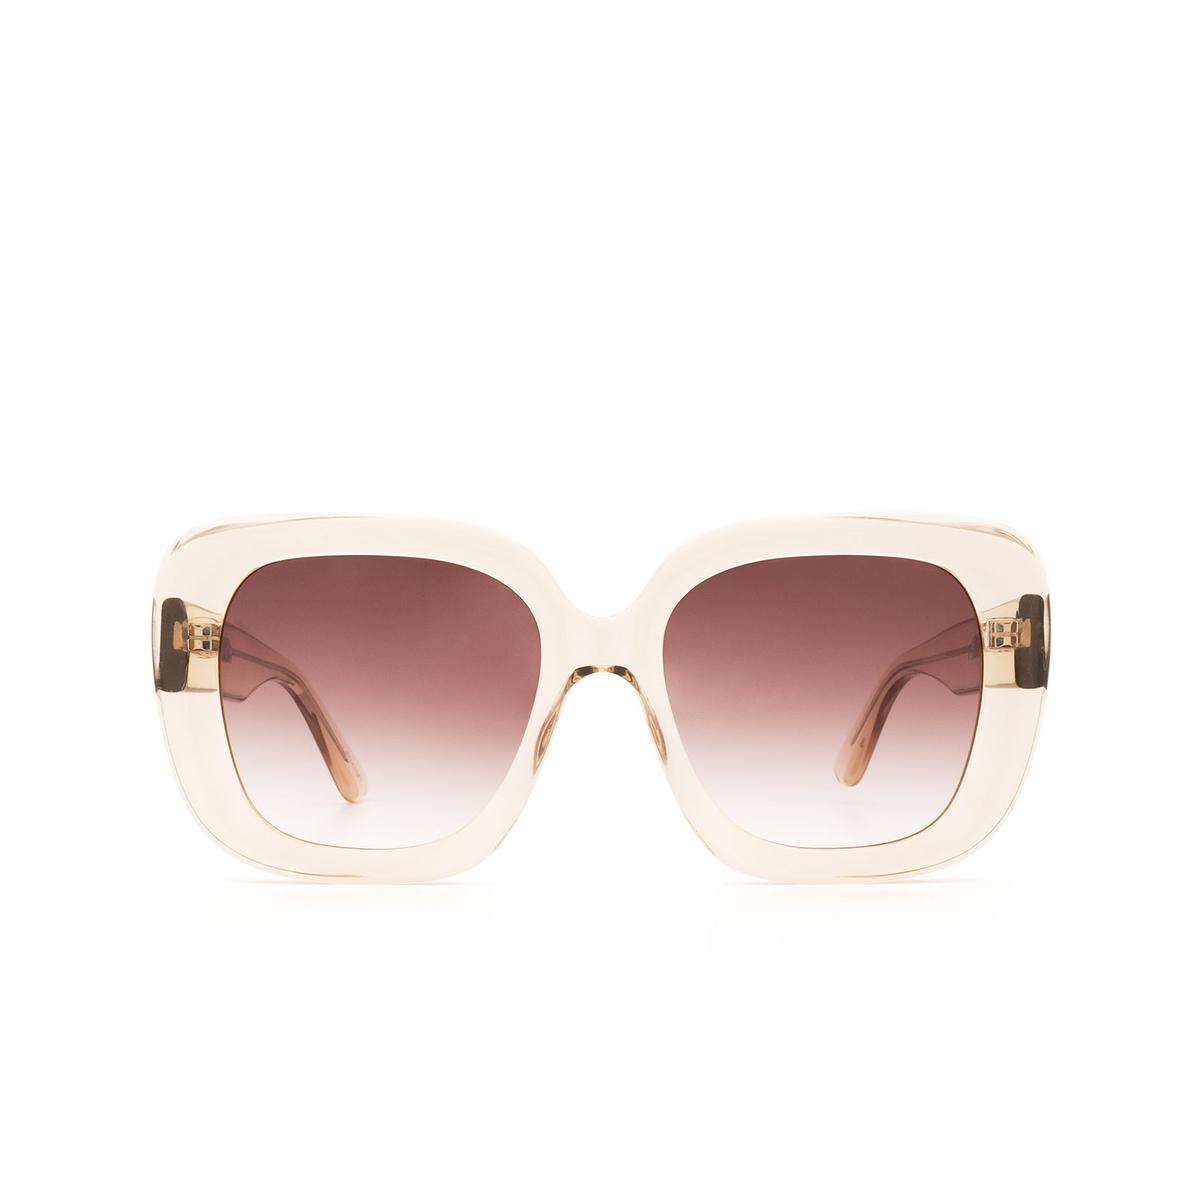 Chimi® Square Sunglasses: #108 color Light Beige Ecru - front view.